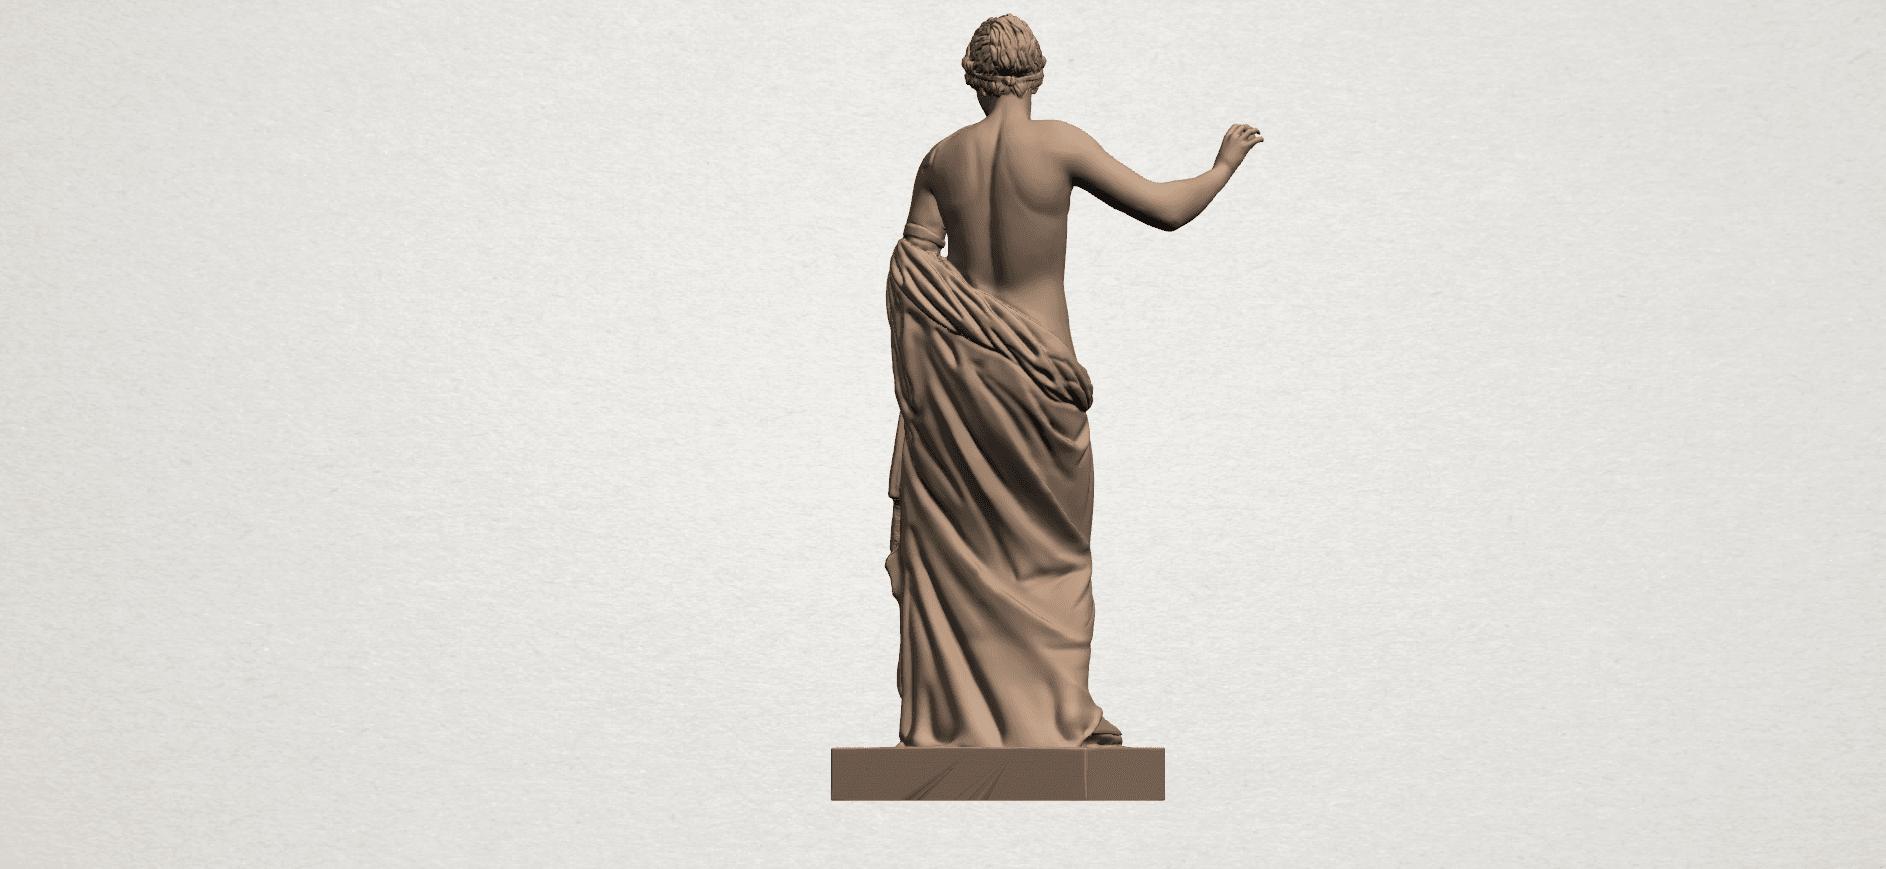 Naked Girl (xiv) A06.png Download free STL file Naked Girl 14 • 3D printer design, GeorgesNikkei